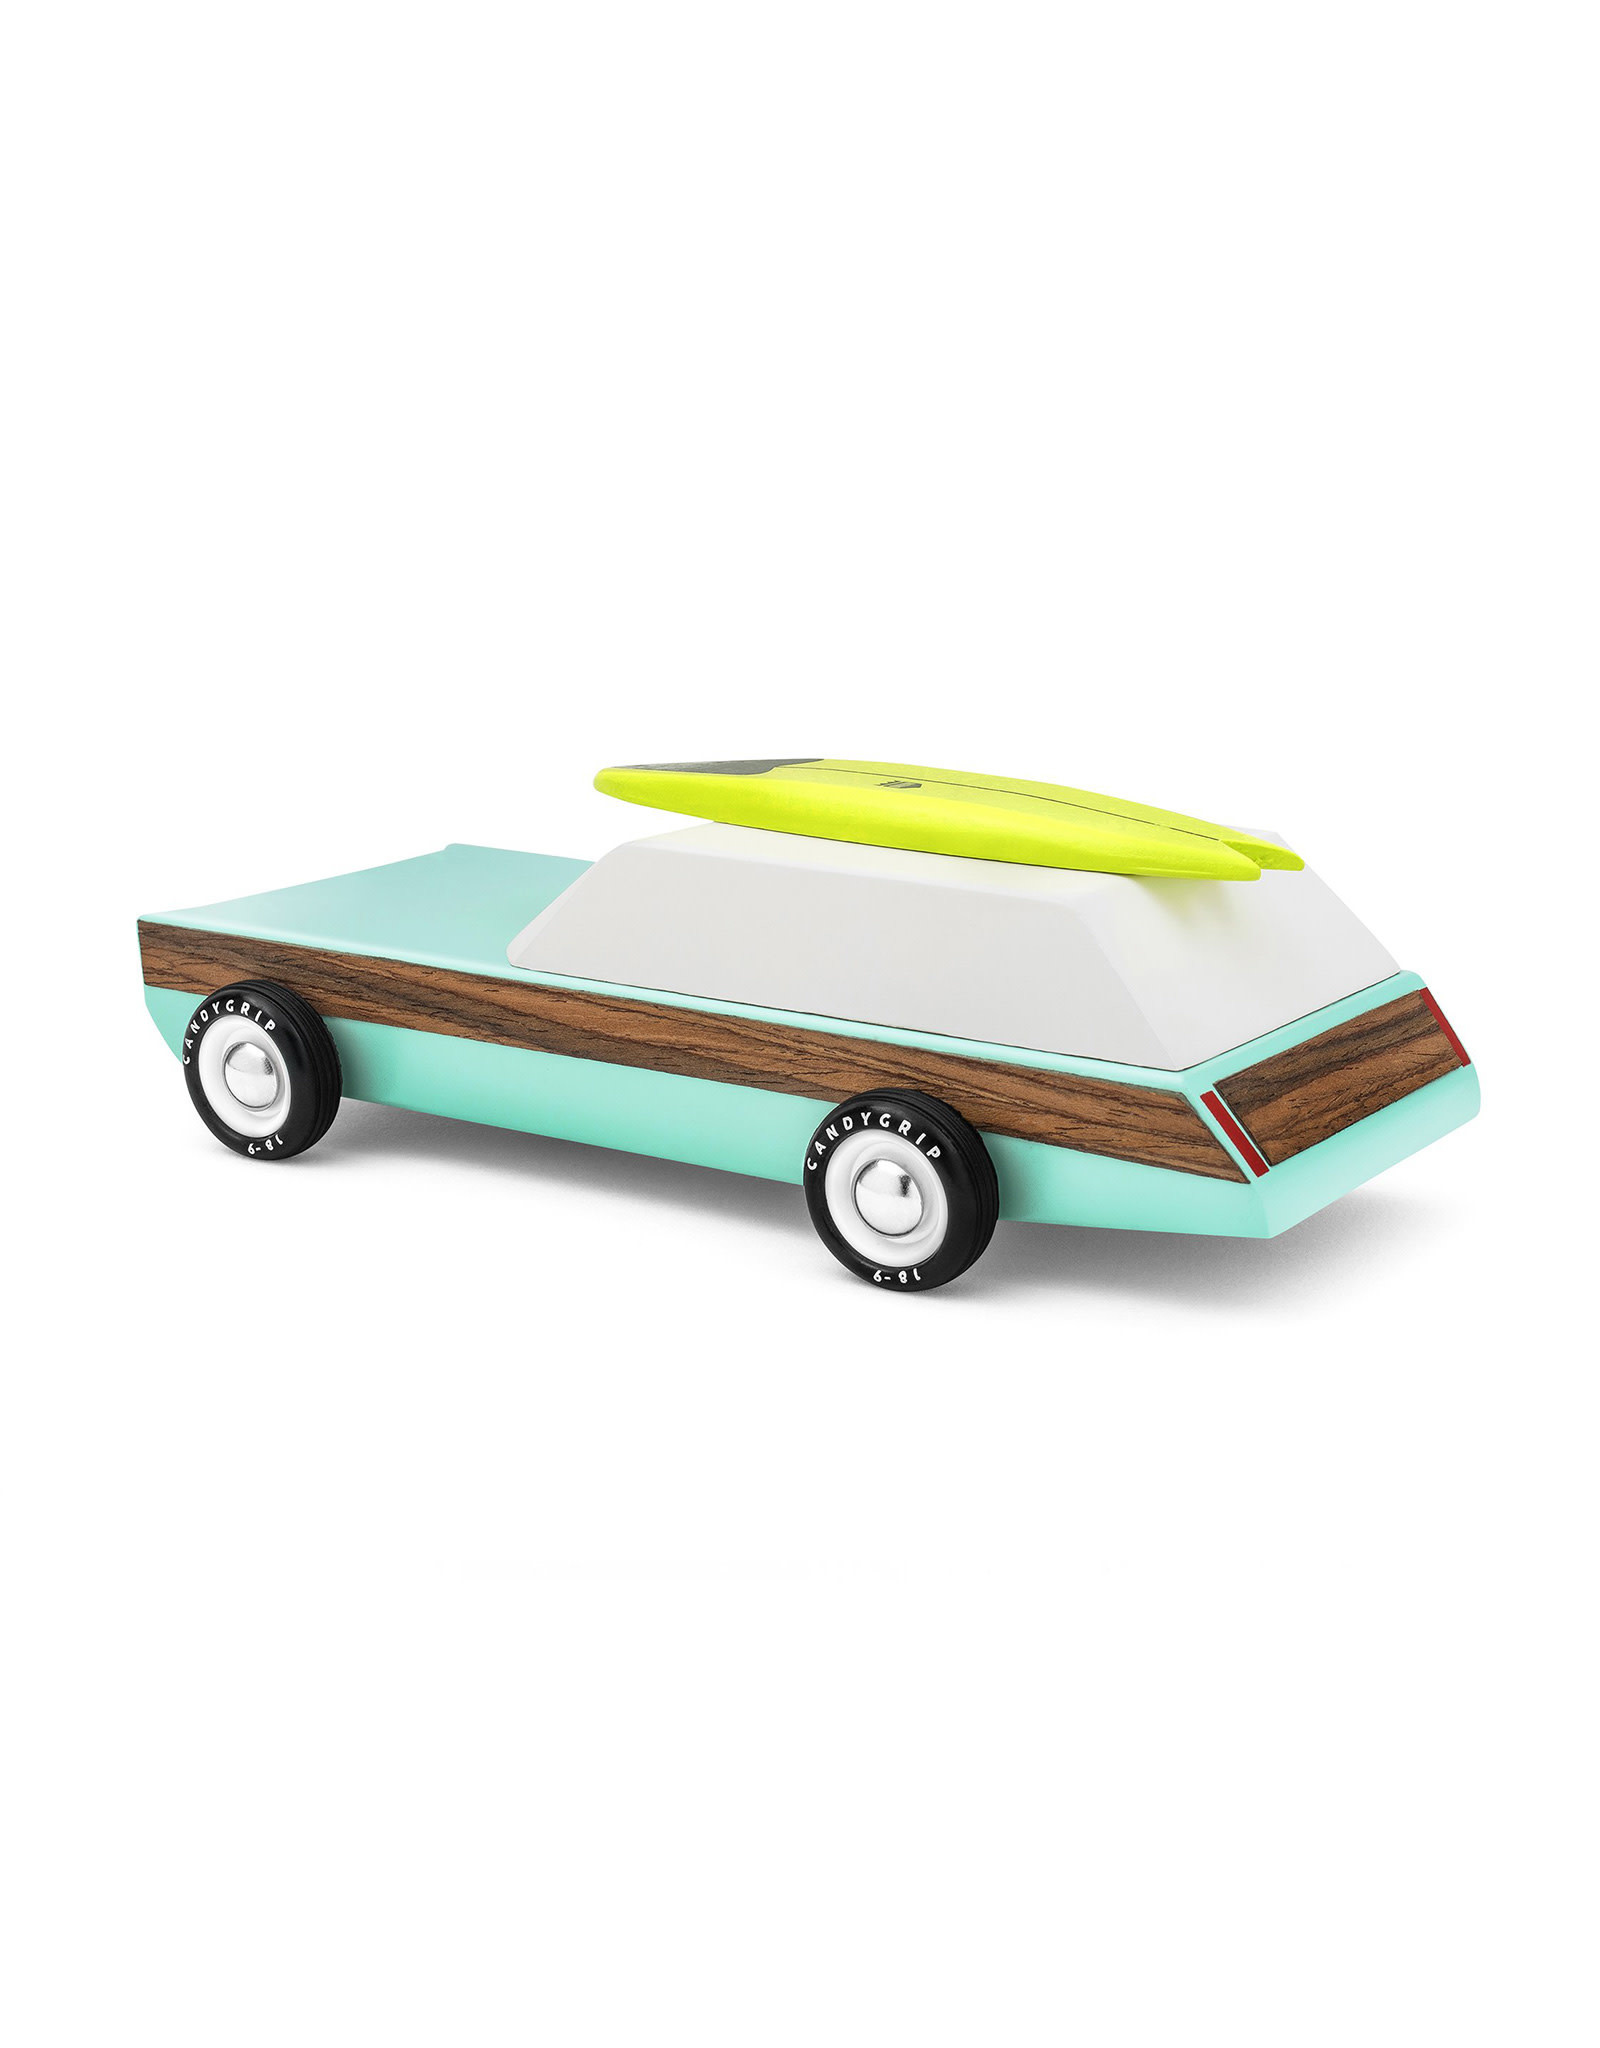 Candylab Wooden car - Candylab - Woodie Redux